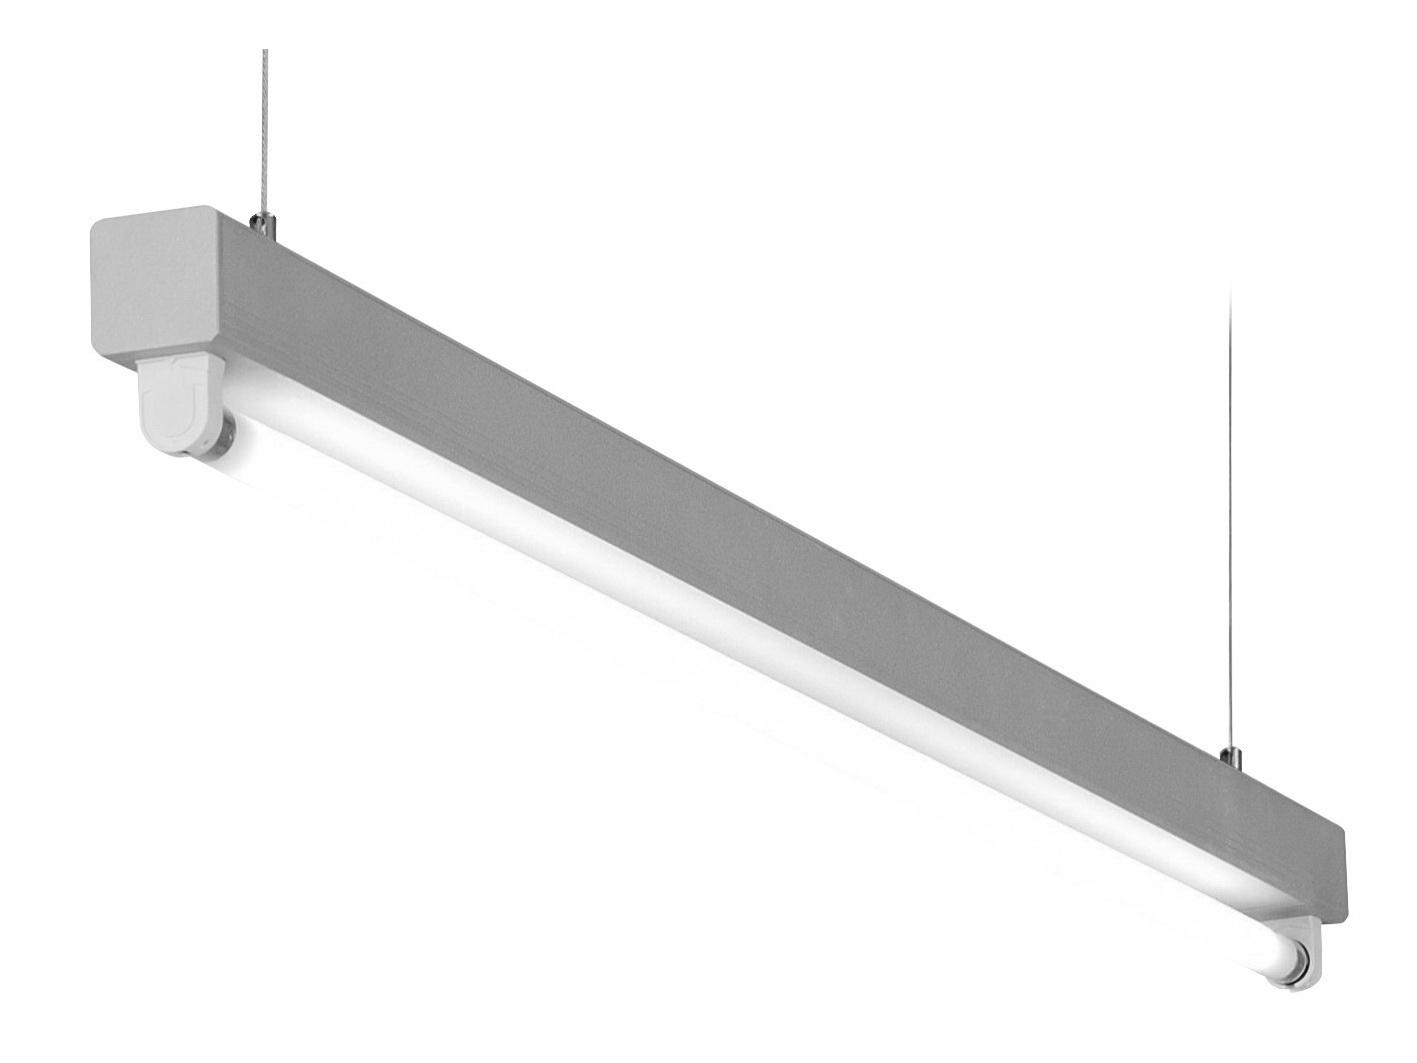 1 Stk Lucie T5 1x21/39W Aluminium Lichtleiste, QTI EVG LI38LUC139